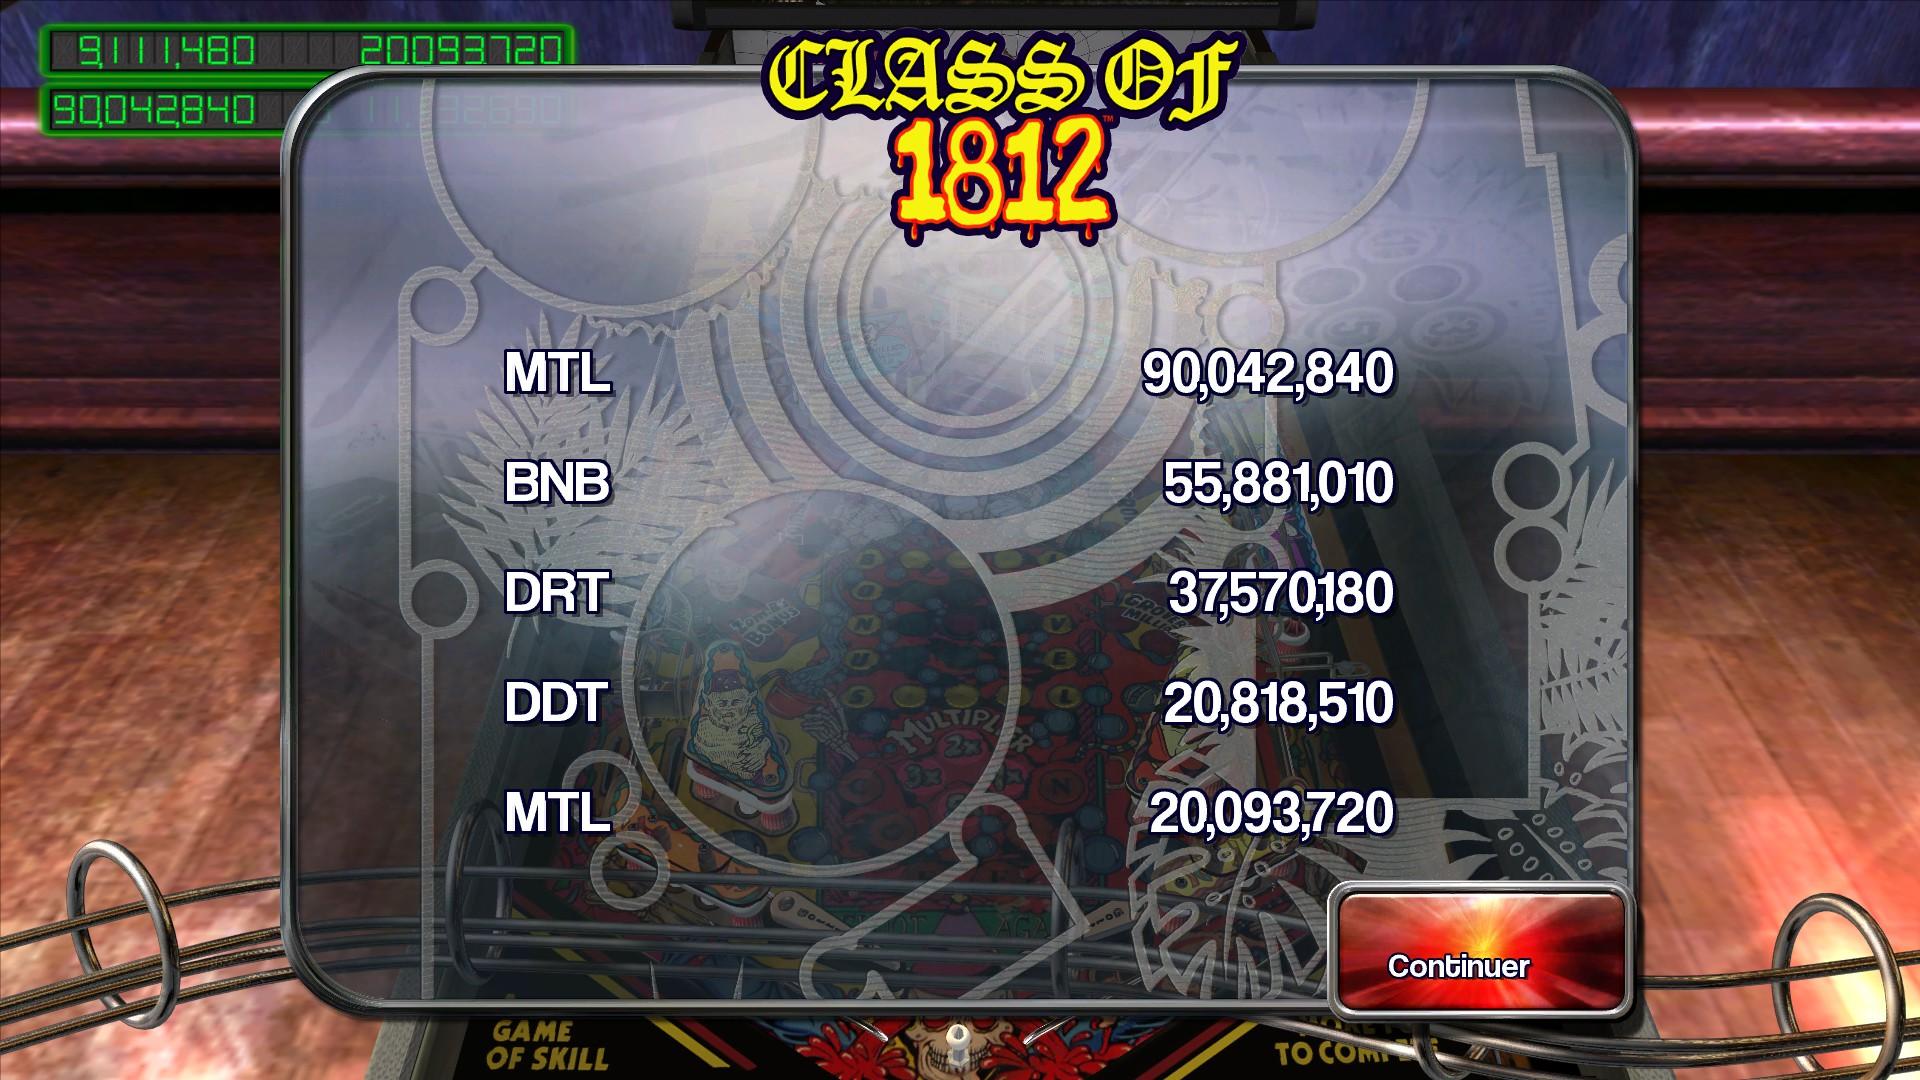 Mantalow: Pinball Arcade: Class of 1812 (PC) 90,042,840 points on 2015-08-29 11:06:10